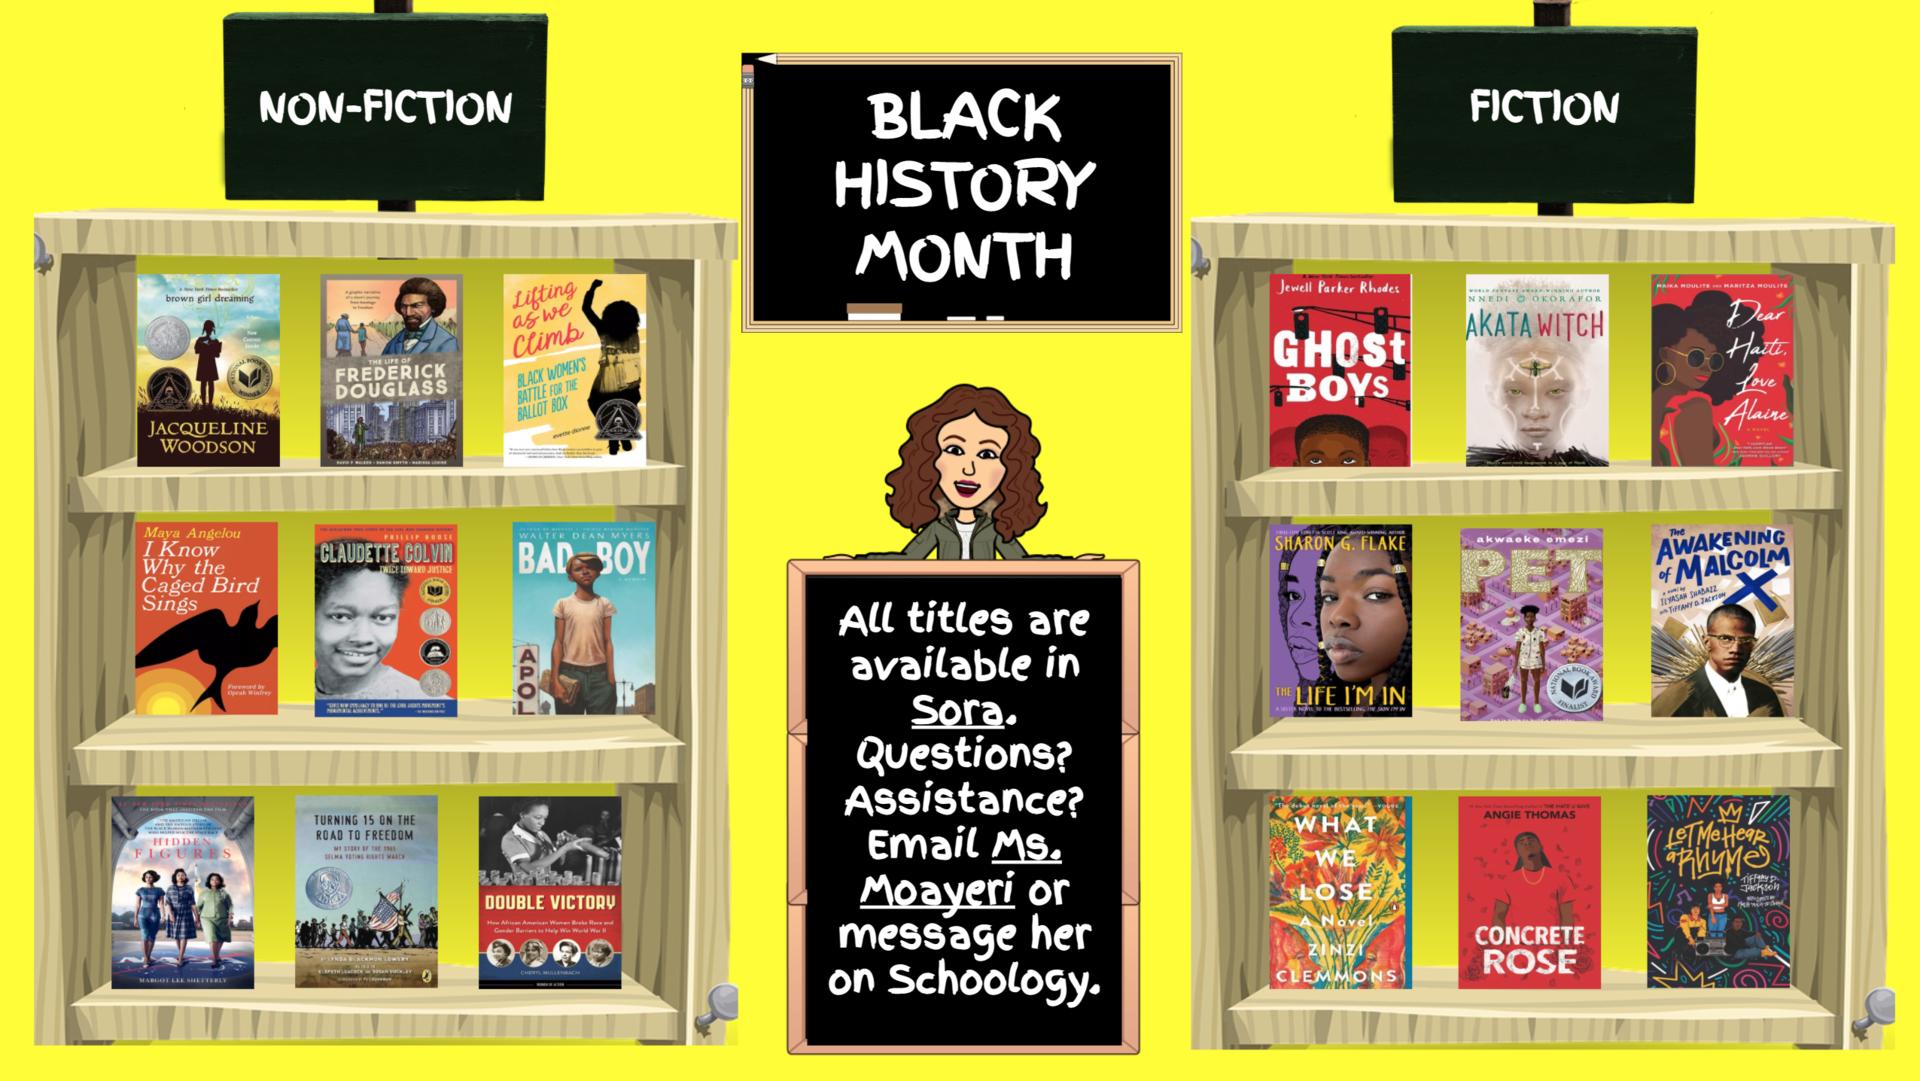 Black History Month Titles